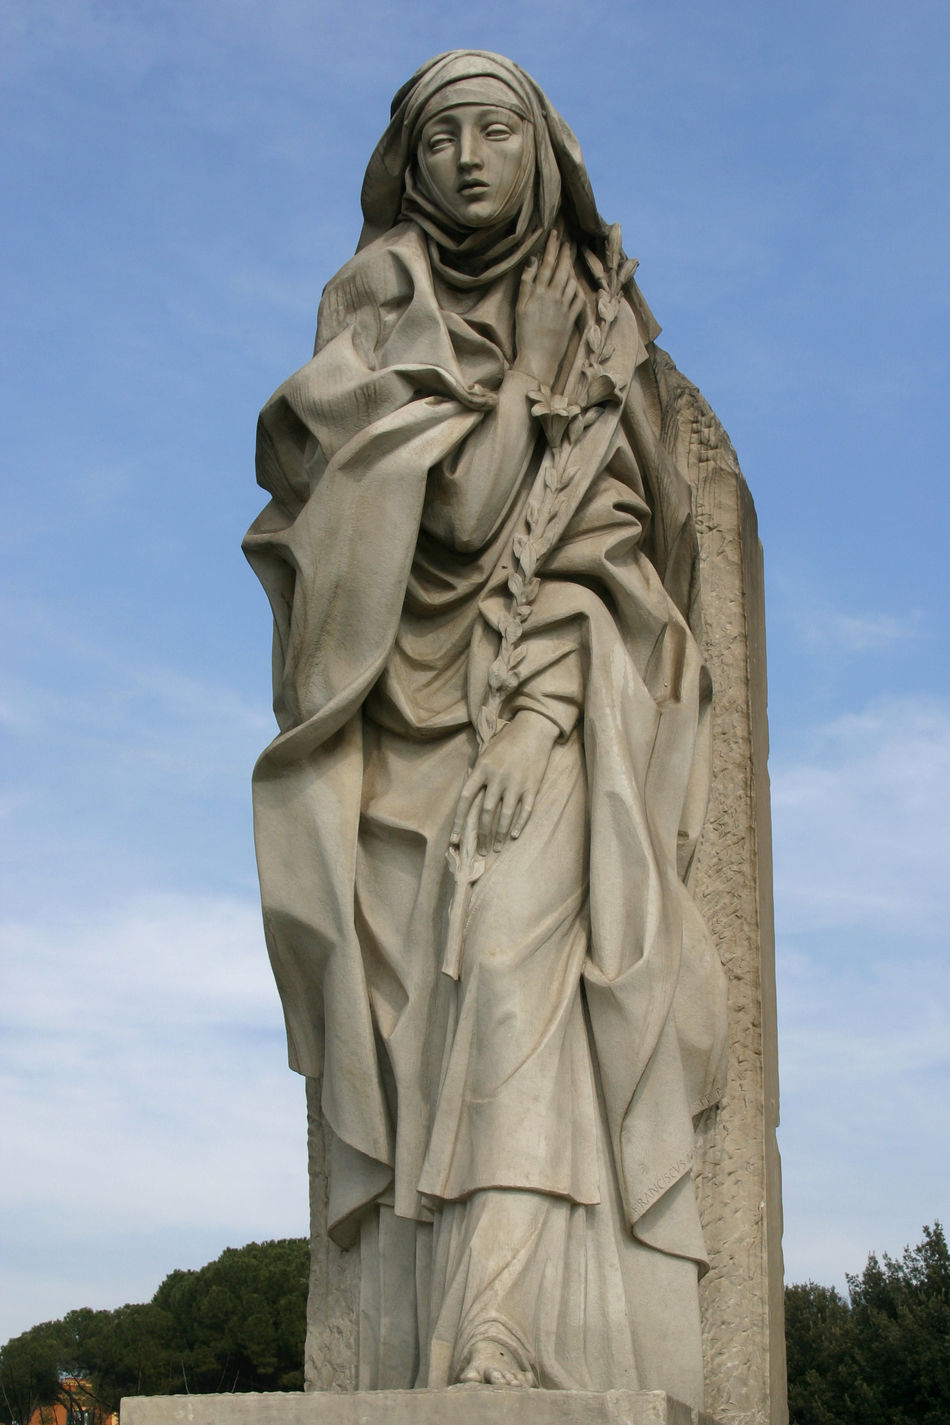 Saint Catherine of Siena, statue in Rome Art Carving - Craft Product Catherine Catherine Of Siena Christianity Creativity Faith Historic Monument Religion Rome Saint Sculpture Siena Statue